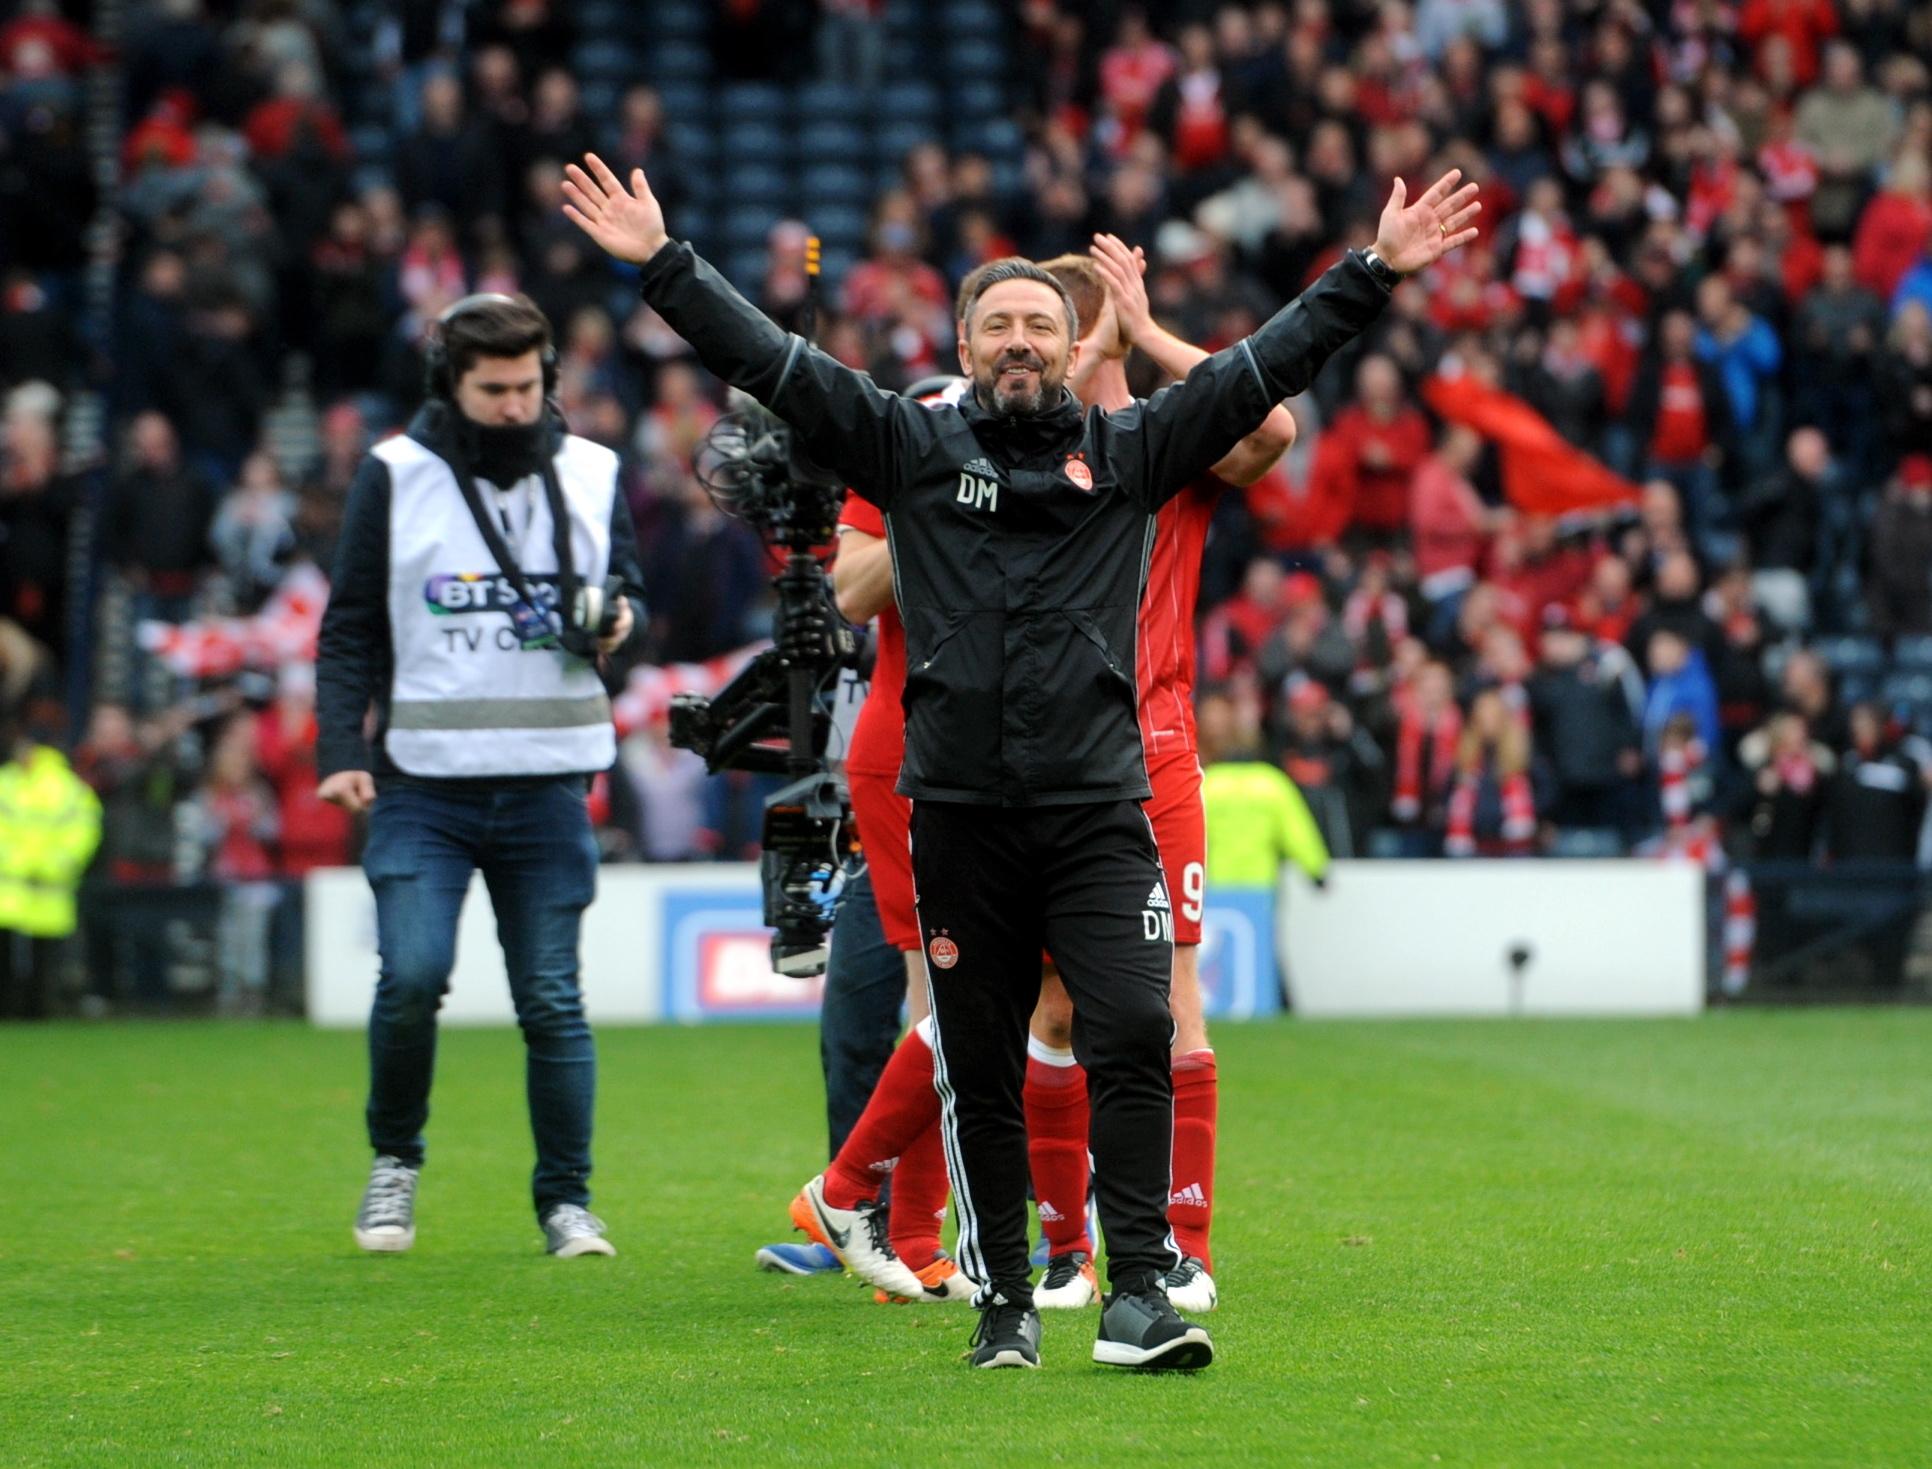 Derek McInnes celebrates at the final whistle.